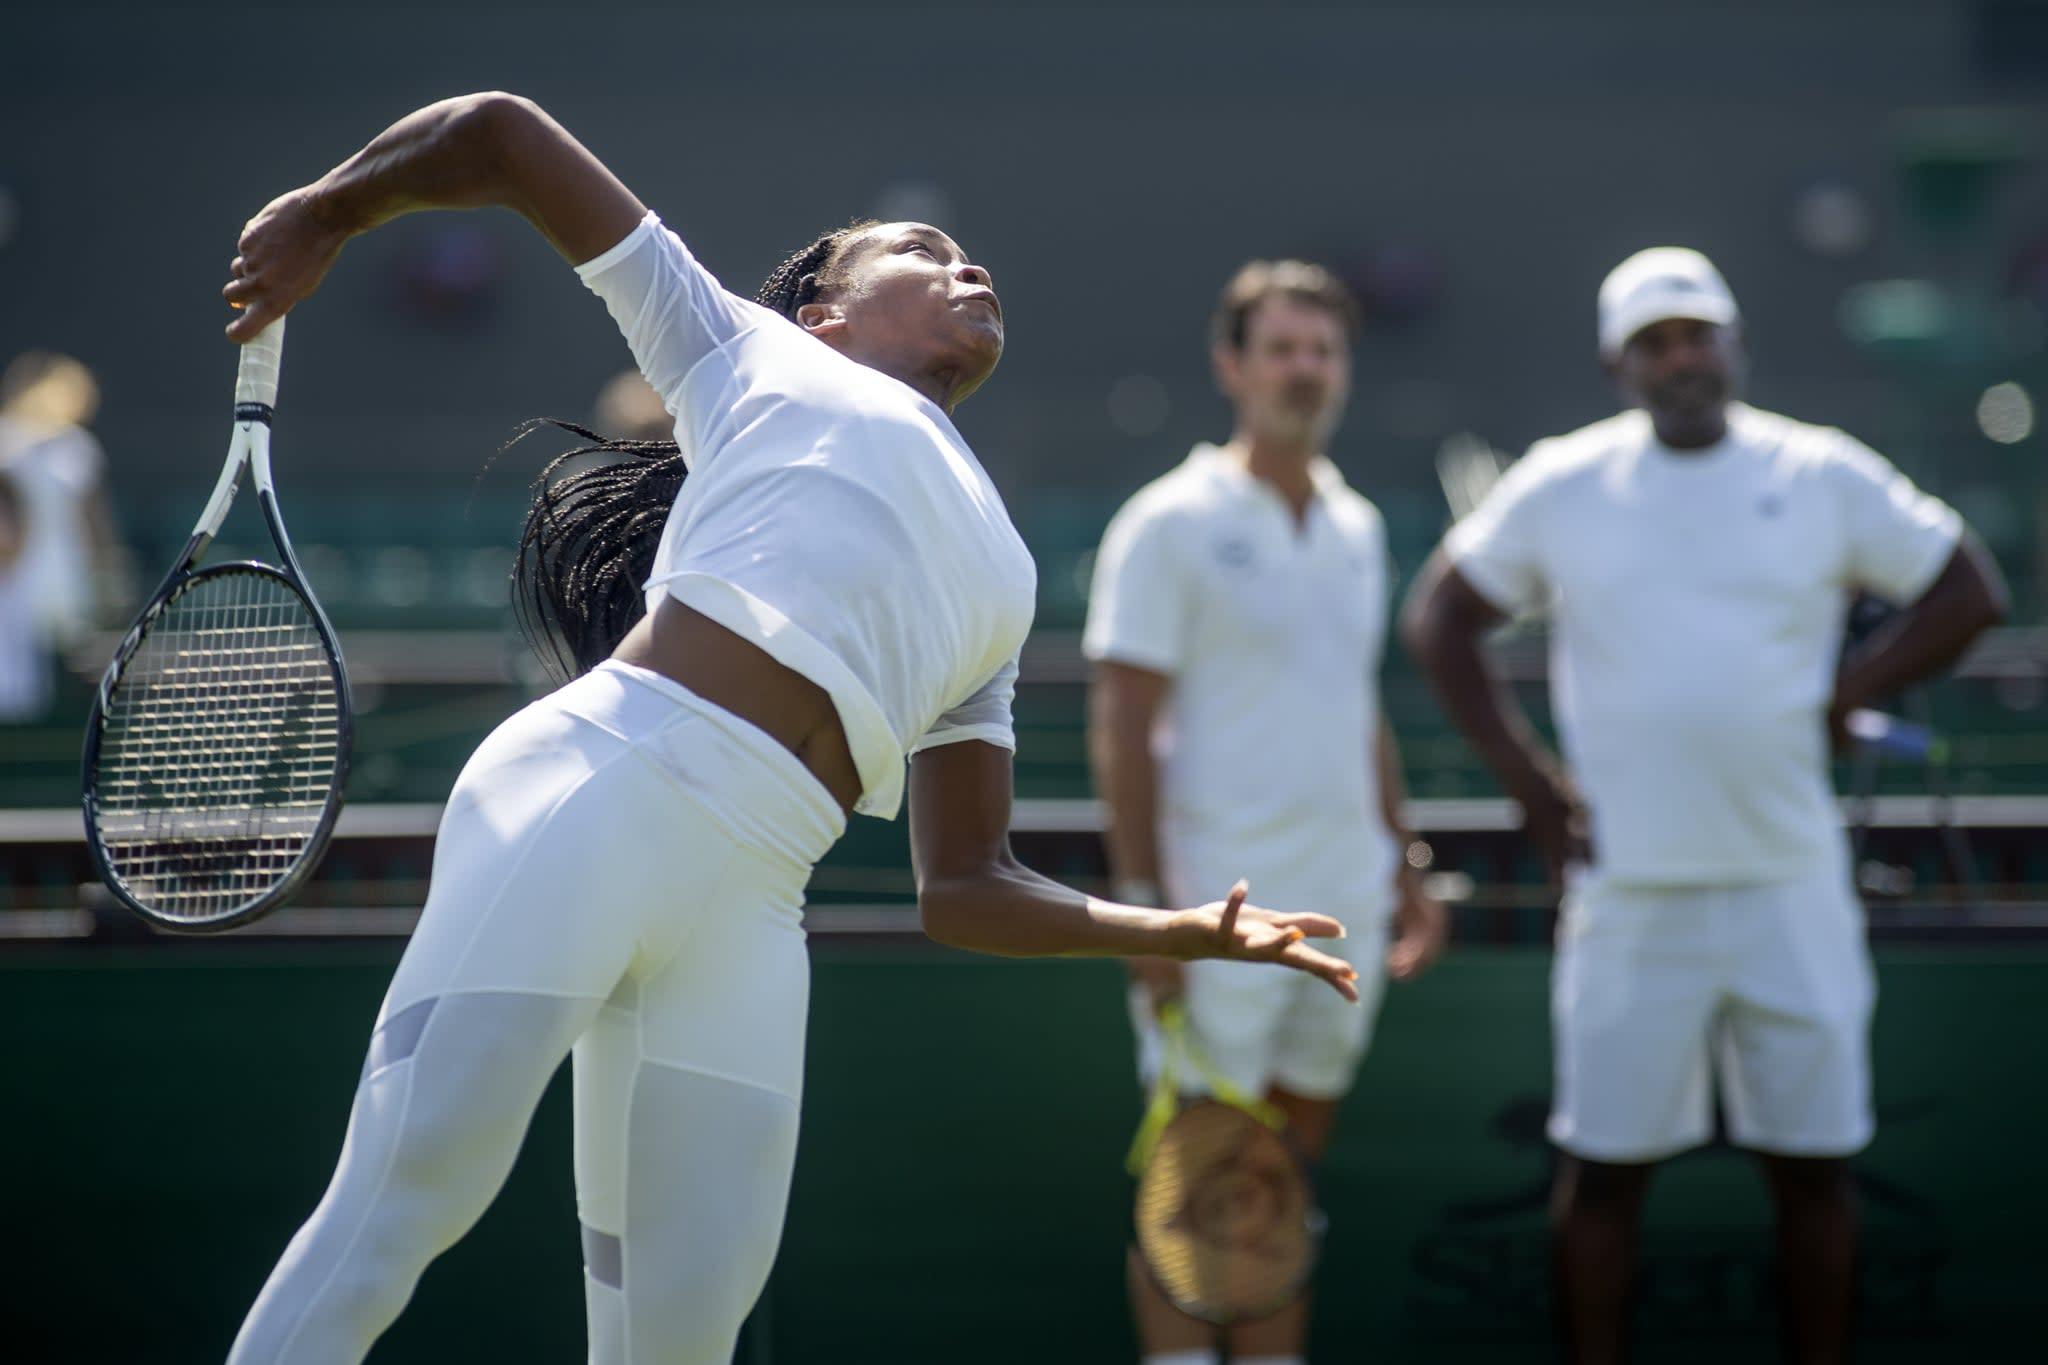 "<p>Coco Gauff has been dubbed <a href=""https://www.popsugar.com/fitness/Cori-Gauff-Beats-Venus-Williams-Wimbledon-2019-46336596"" class=""link rapid-noclick-resp"" rel=""nofollow noopener"" target=""_blank"" data-ylk=""slk:the future of women's tennis"">the future of women's tennis</a>, and we love watching her matches. Mouratoglou helps supervise Gauff's development alongside her main coach and father, Corey Gauff.</p>"